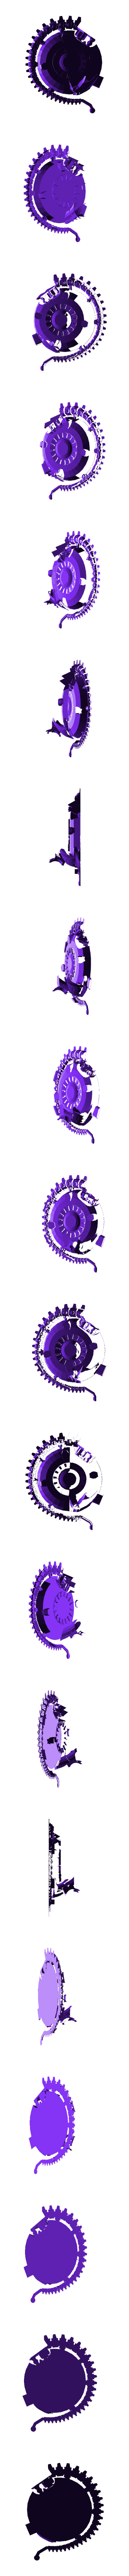 lt_torso.stl Download free STL file Serap-ta-tek BMF walker for Iron Undead • 3D printer model, JtStrait72